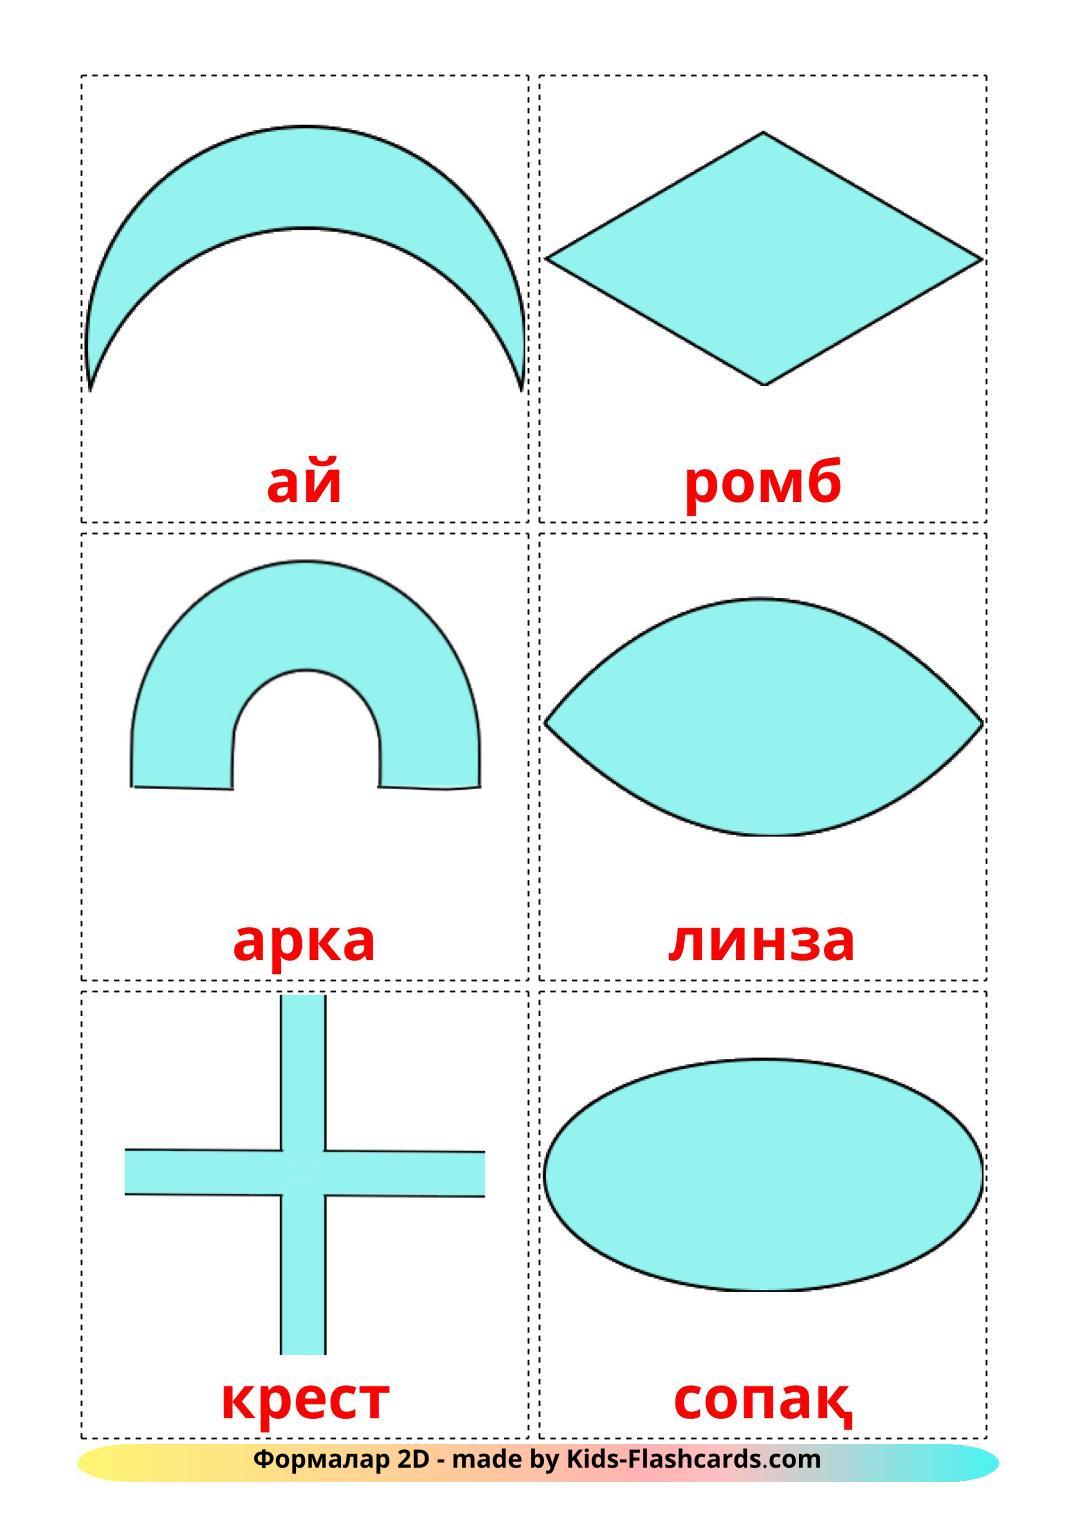 2D Shapes - 35 Free Printable kazakh Flashcards